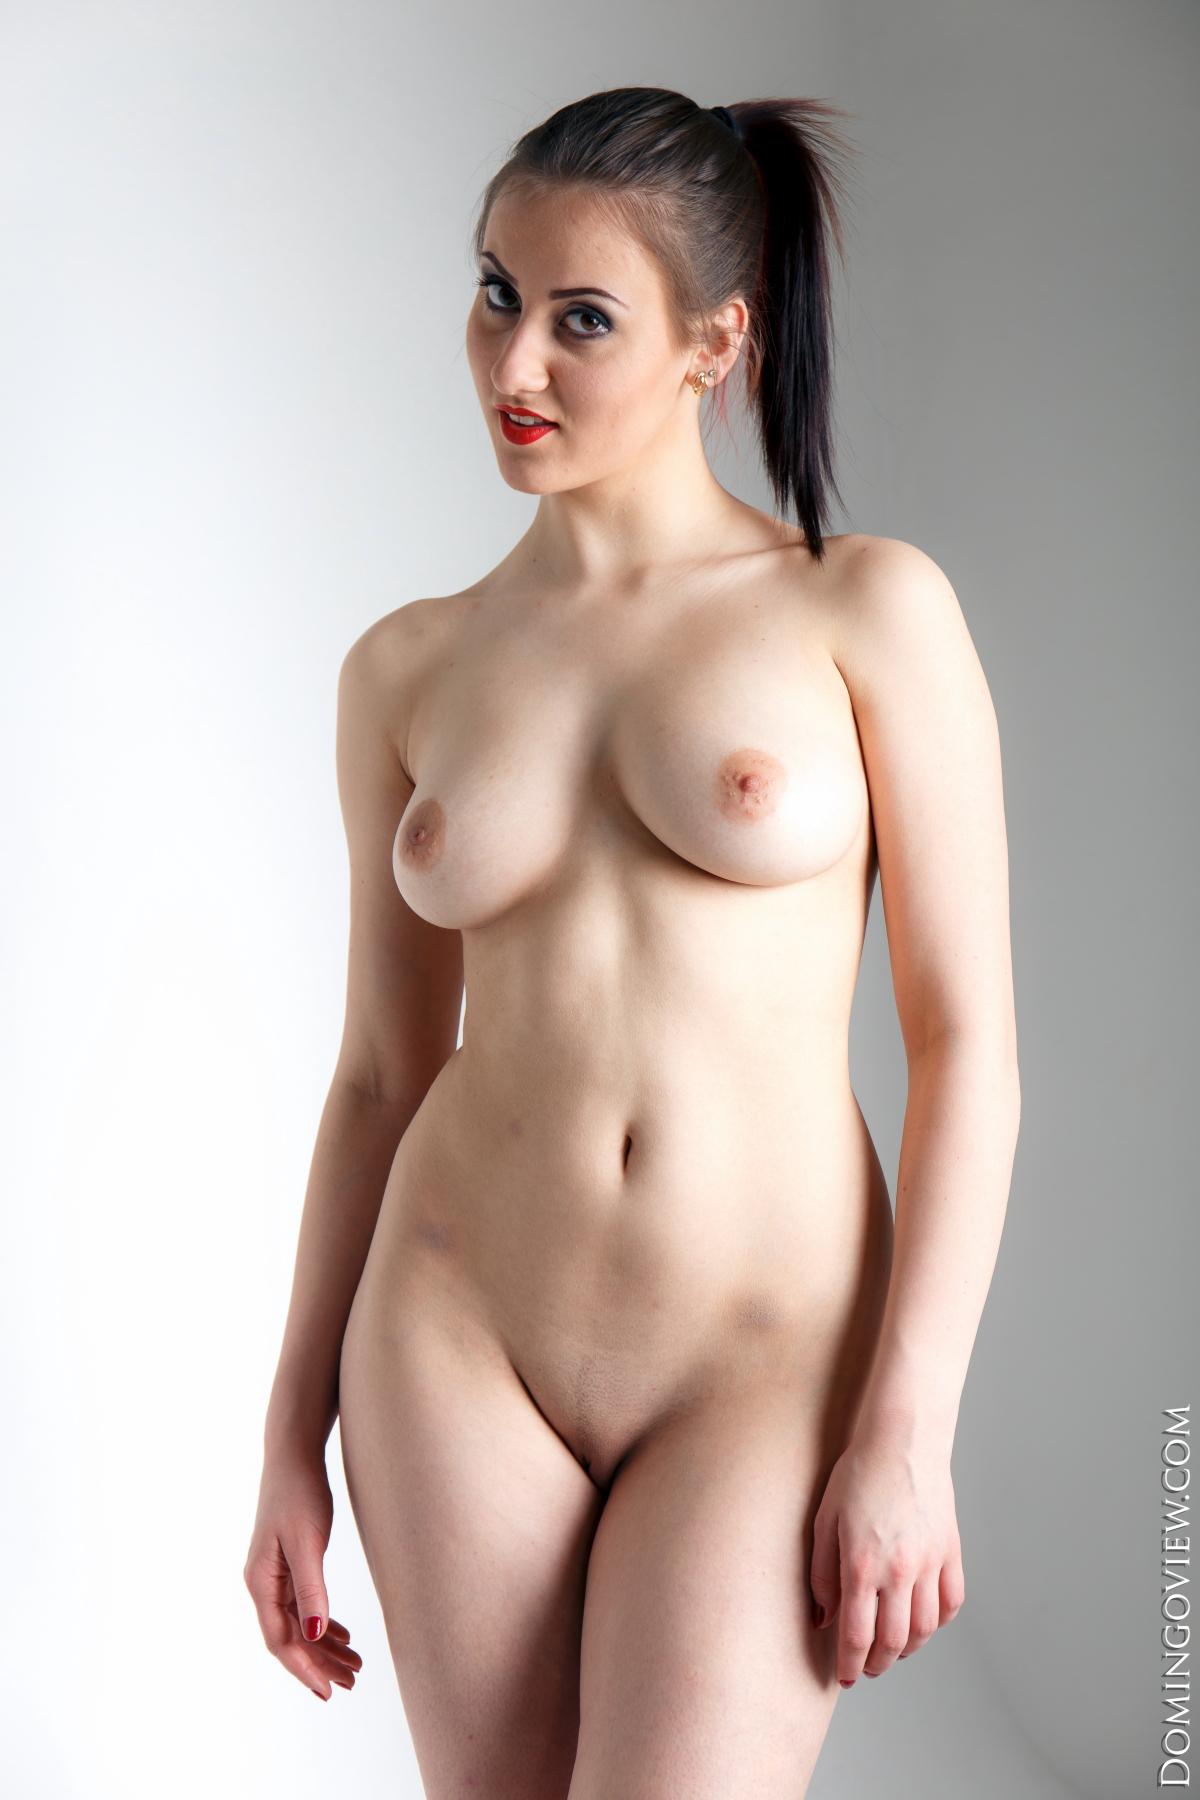 amature mature women tube videos